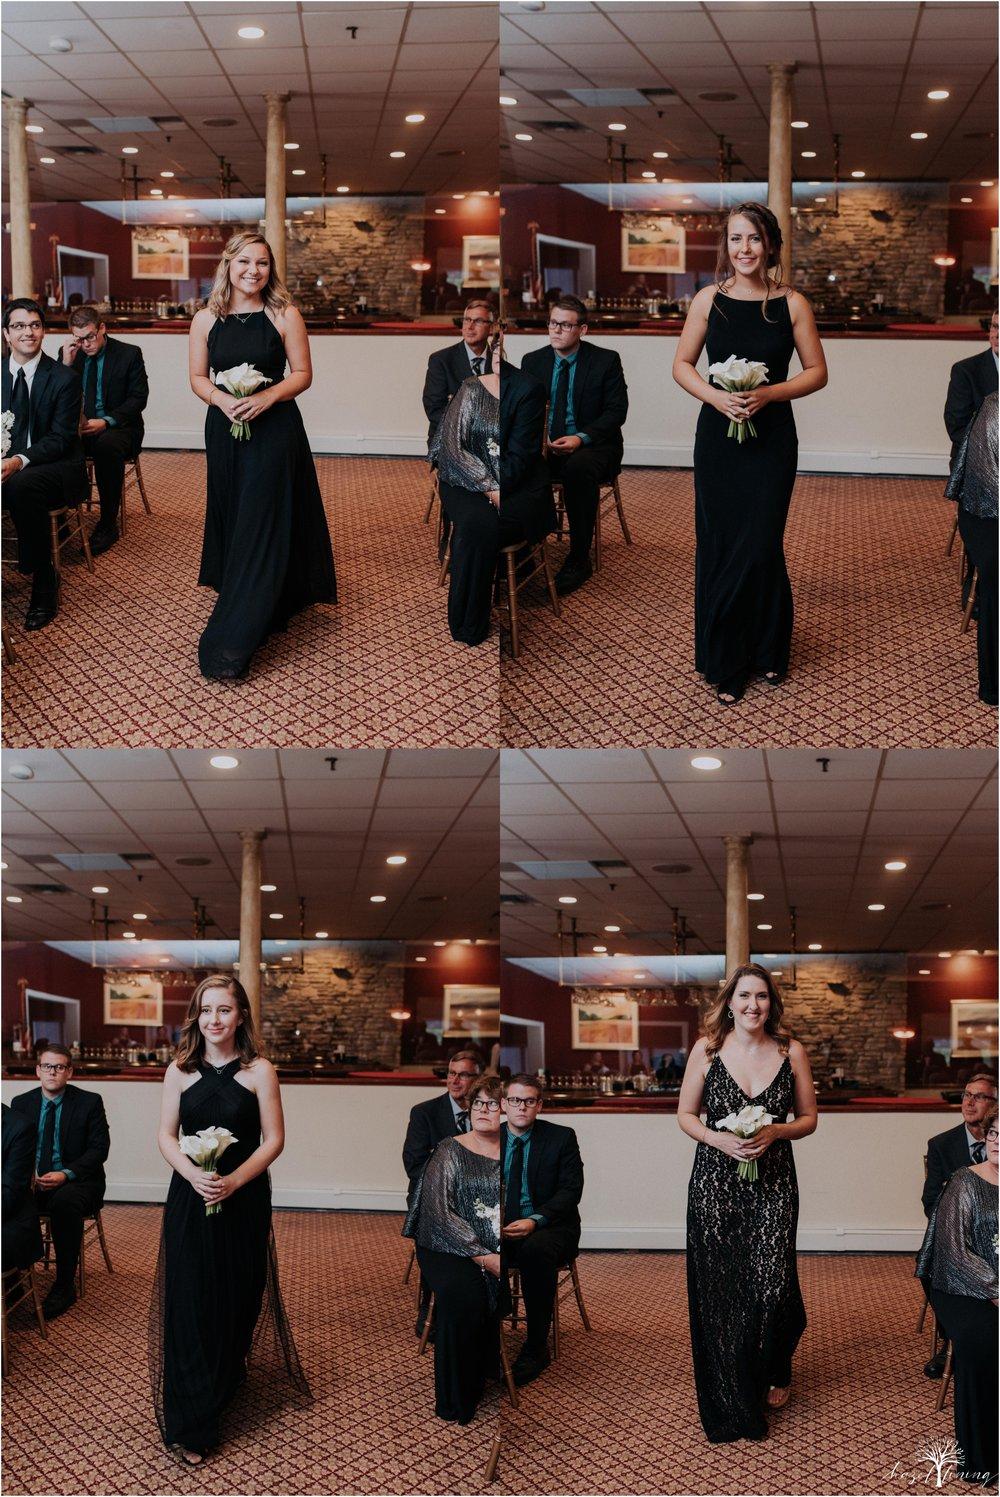 elizabeth-doelp-andrew-foreback-middletown-country-club-summer-langhorne-pennsylvania-wedding-hazel-lining-travel-wedding-elopement-photography_0108.jpg